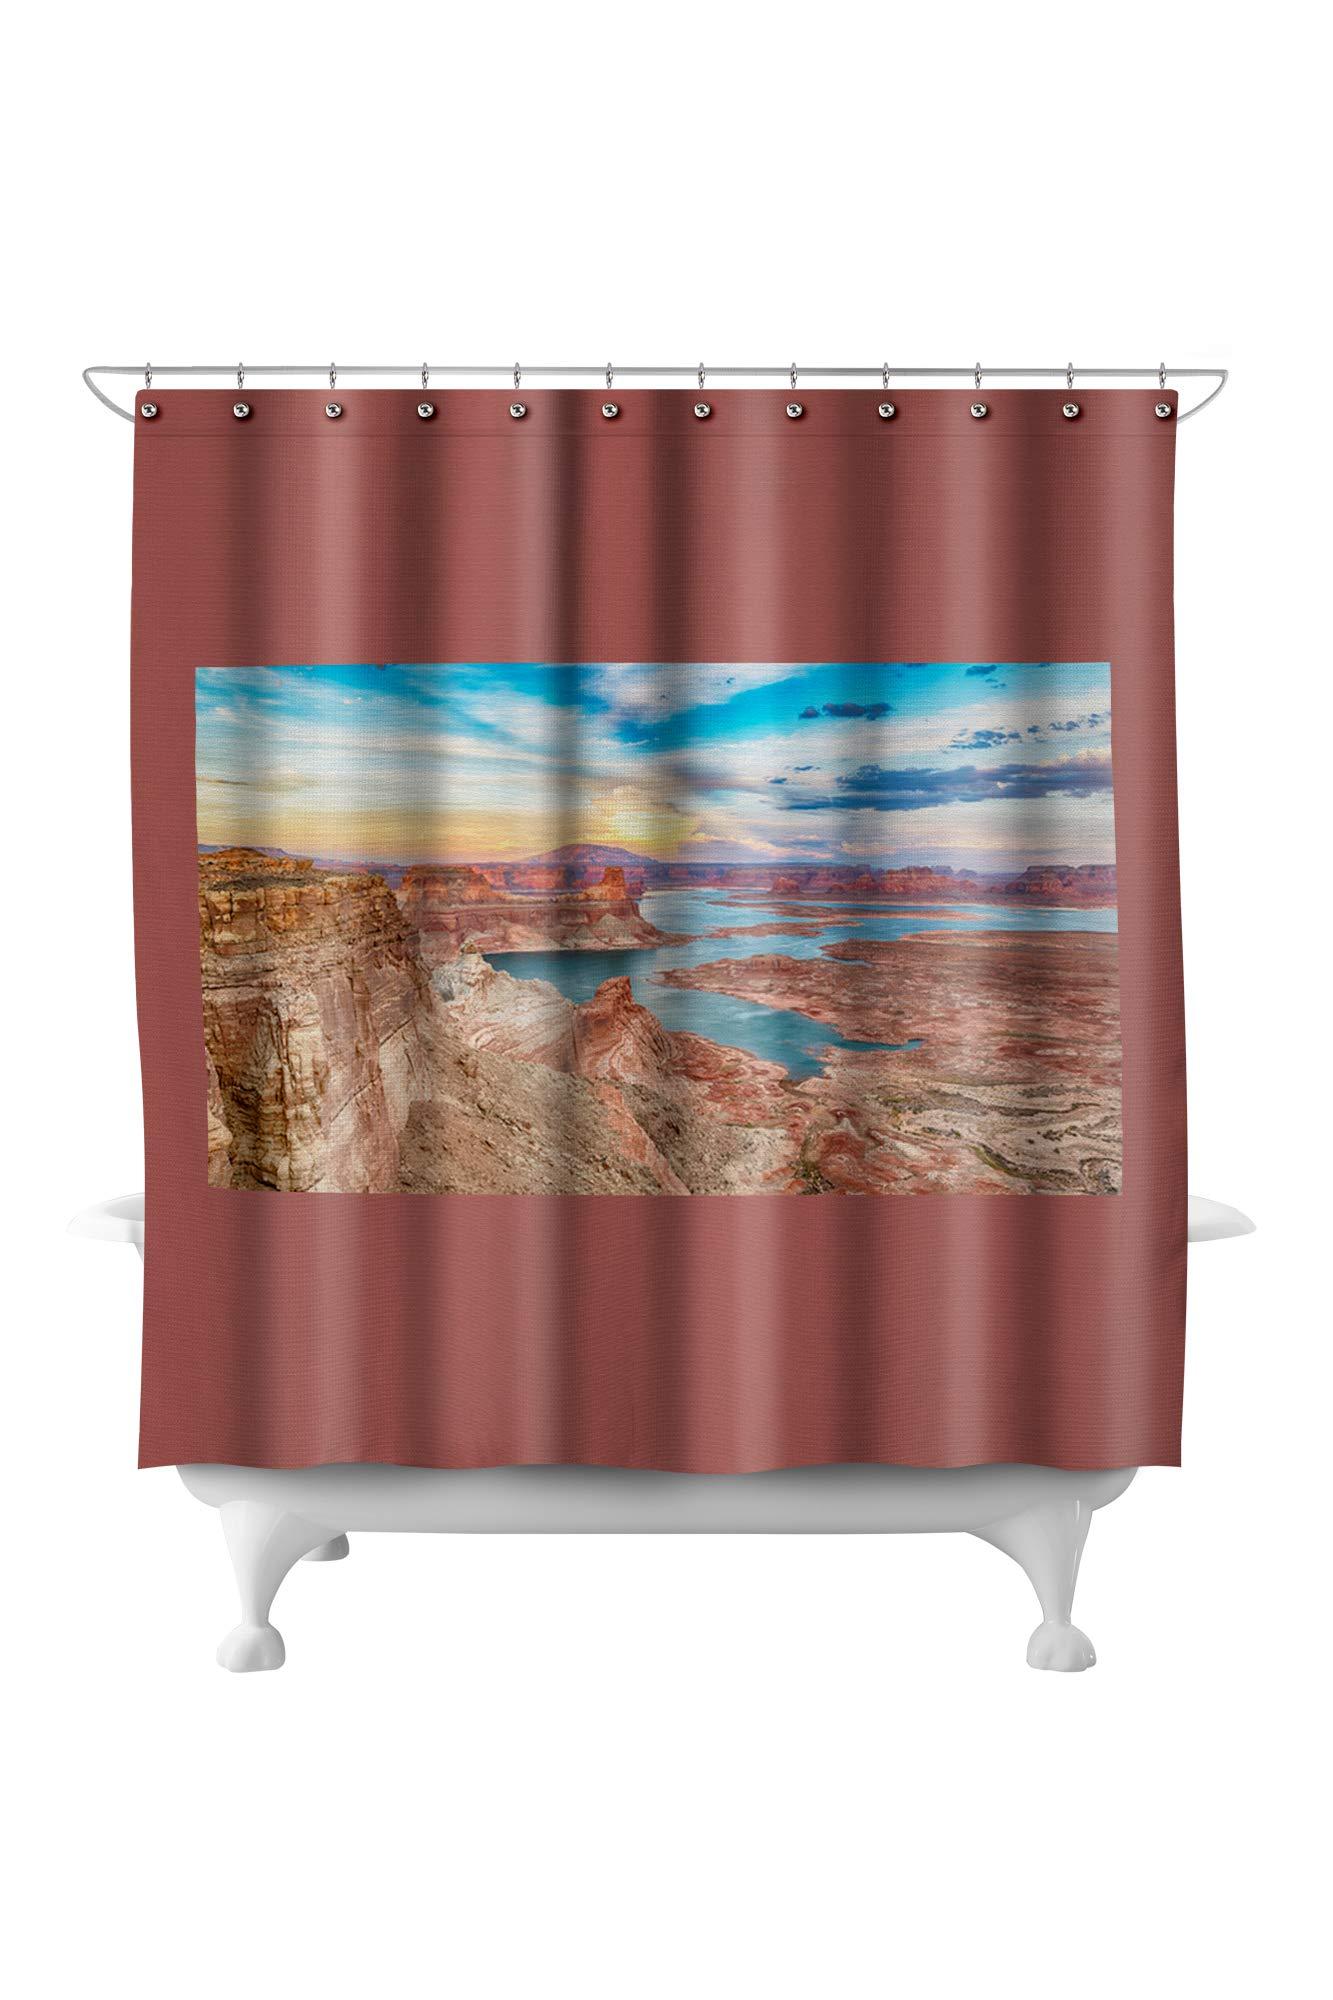 New Nate Berkus Shower Curtain 72 in X 72 in Polyester